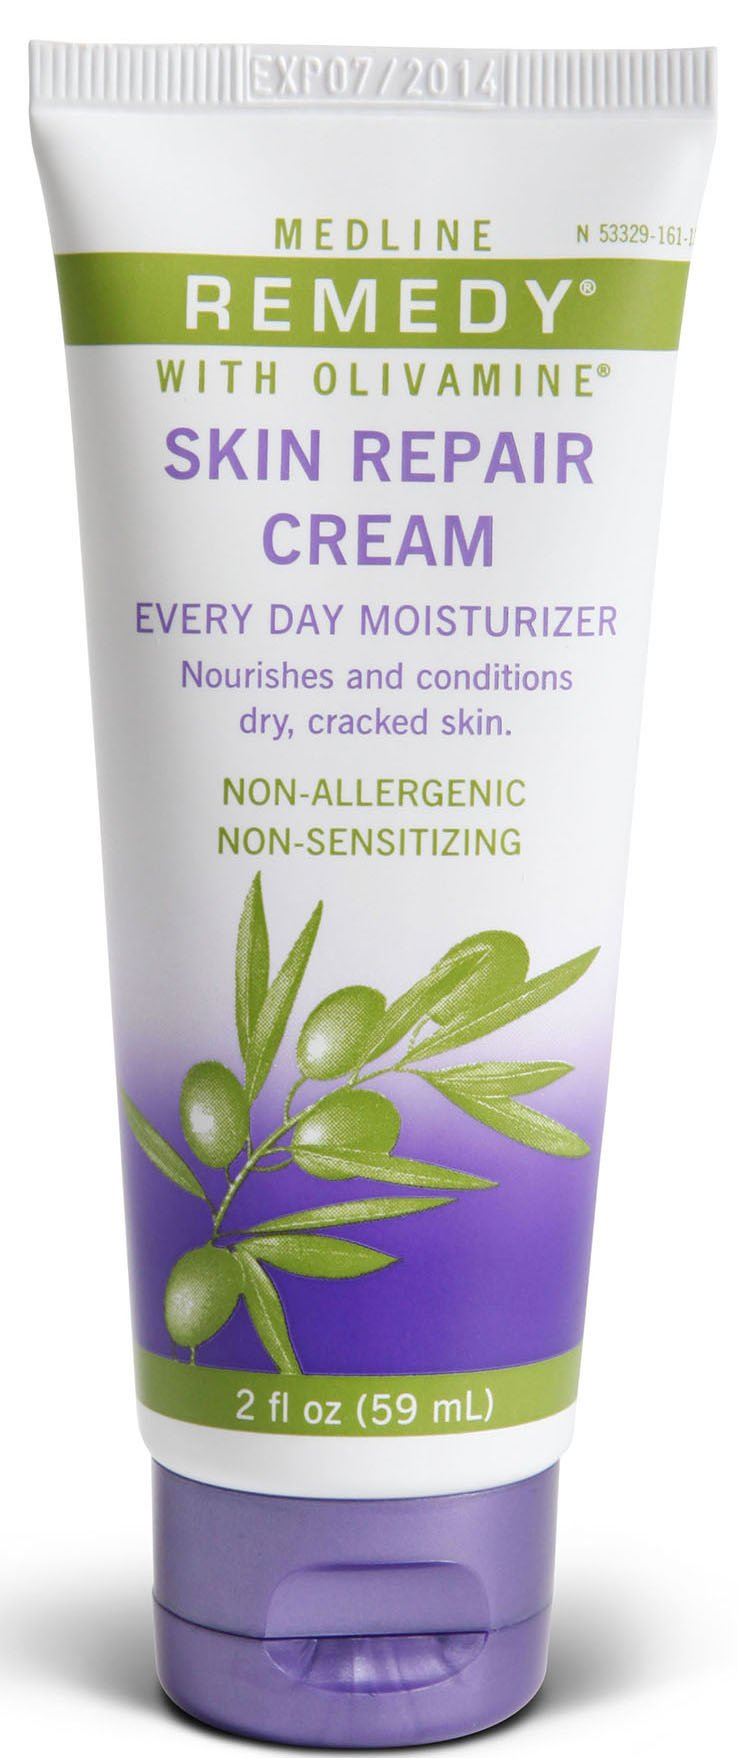 Medline Remedy Olivamine Skin Repair Cream, Off White, 24 Count by Medline